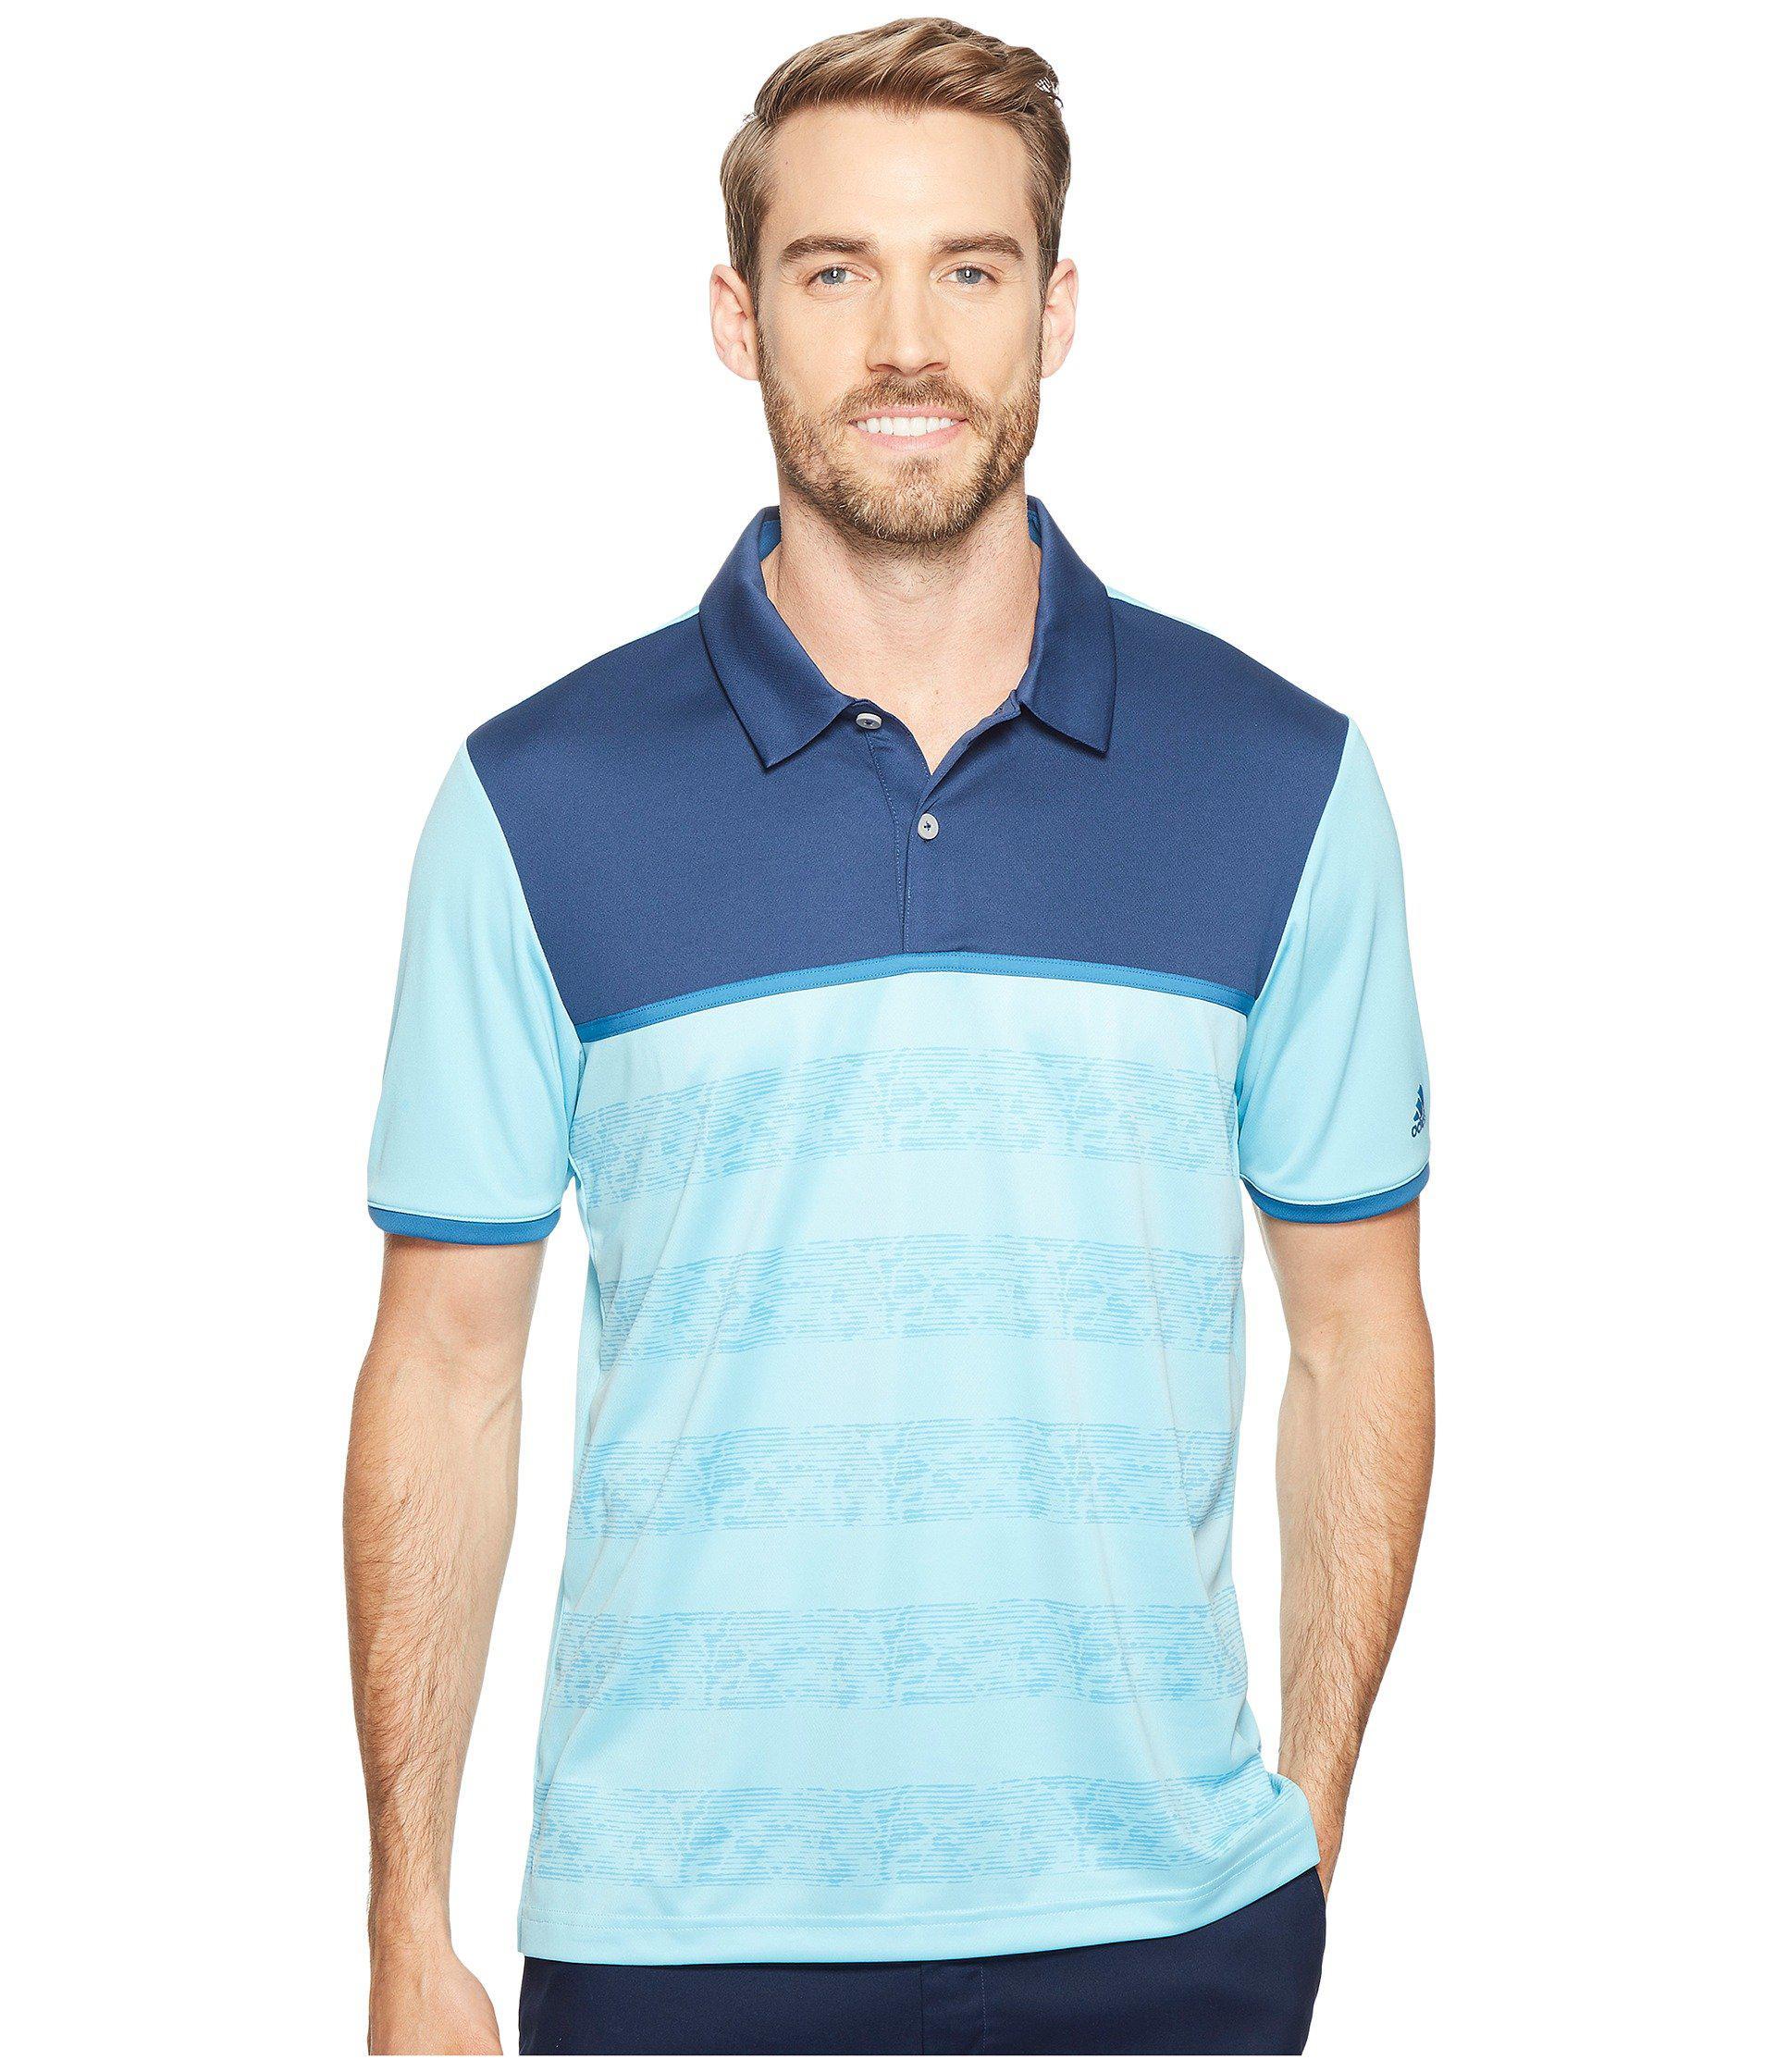 330bc22f Lyst - Adidas Originals Climacool 2d Camo Stripe Print in Blue for Men